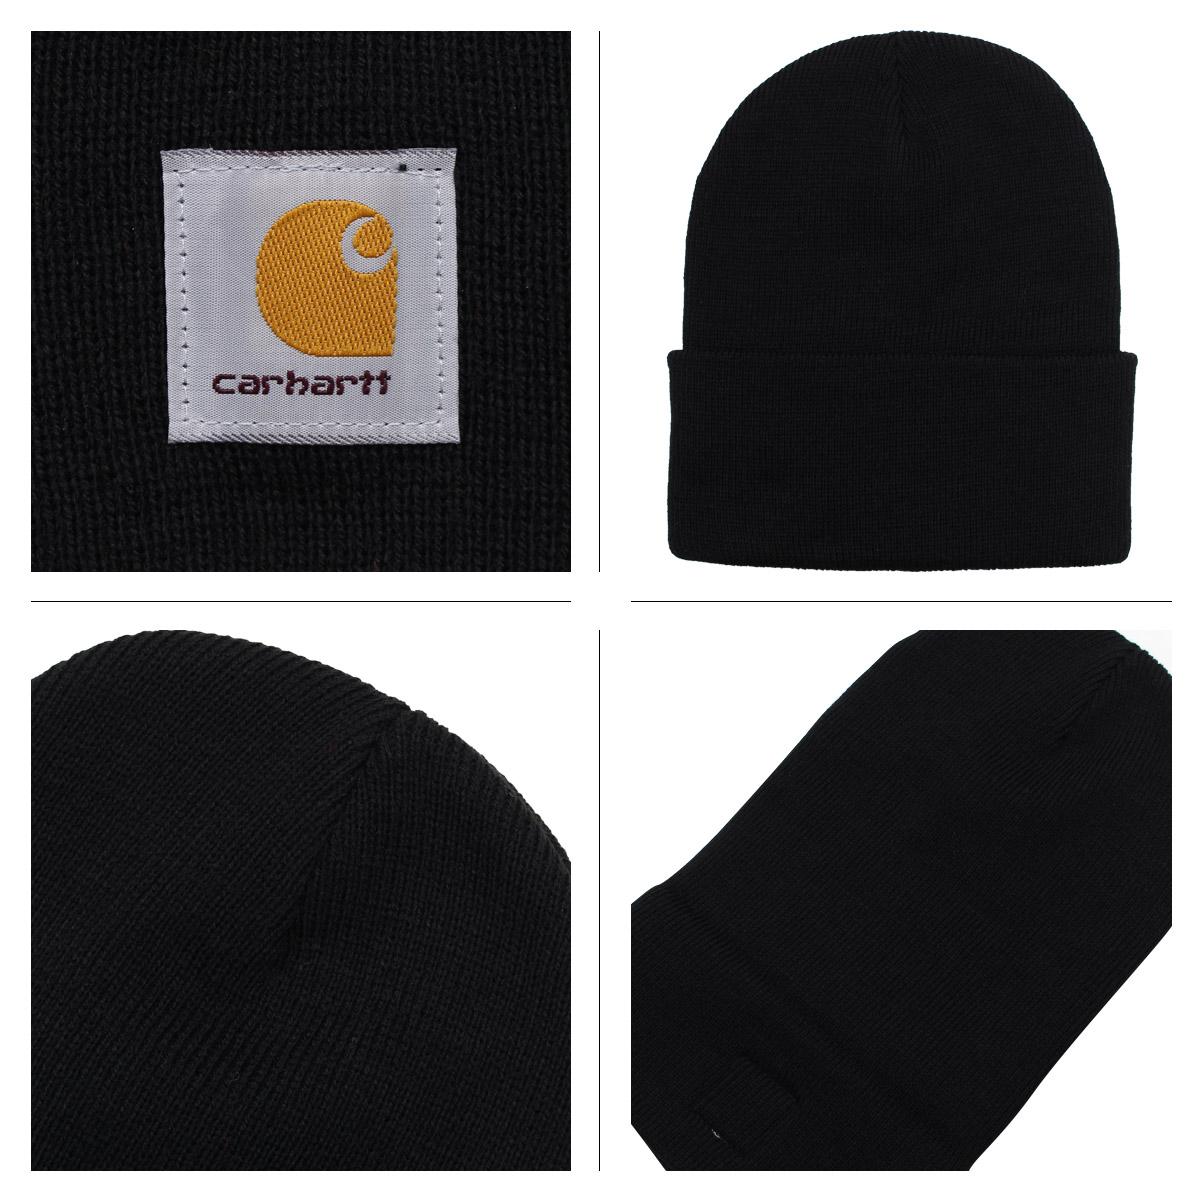 89723d64a8b carhartt ACRYLIC WATCH HAT car heart knit cap knit hat men gap Dis A18  3 9  Shinnyu load   183